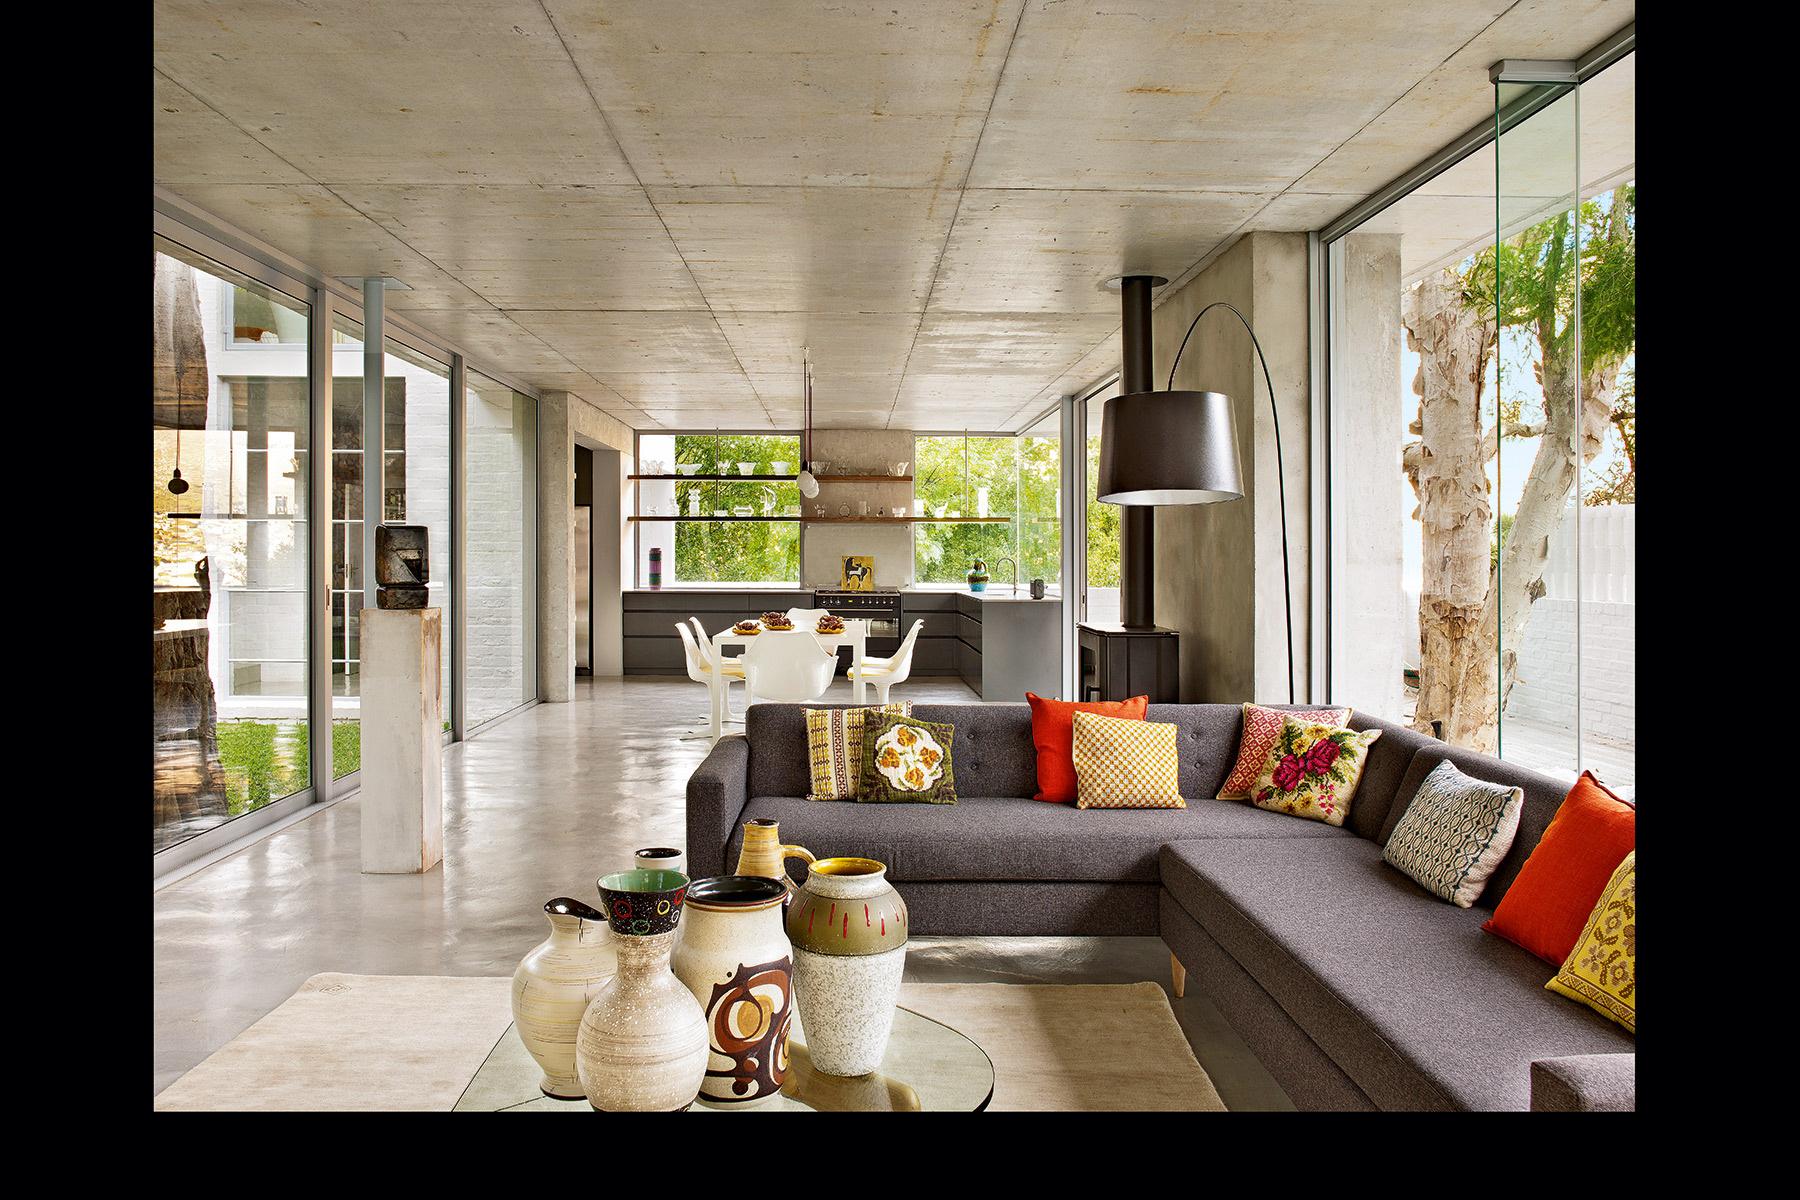 casa_sudafrica_verde_4542_1800x1200